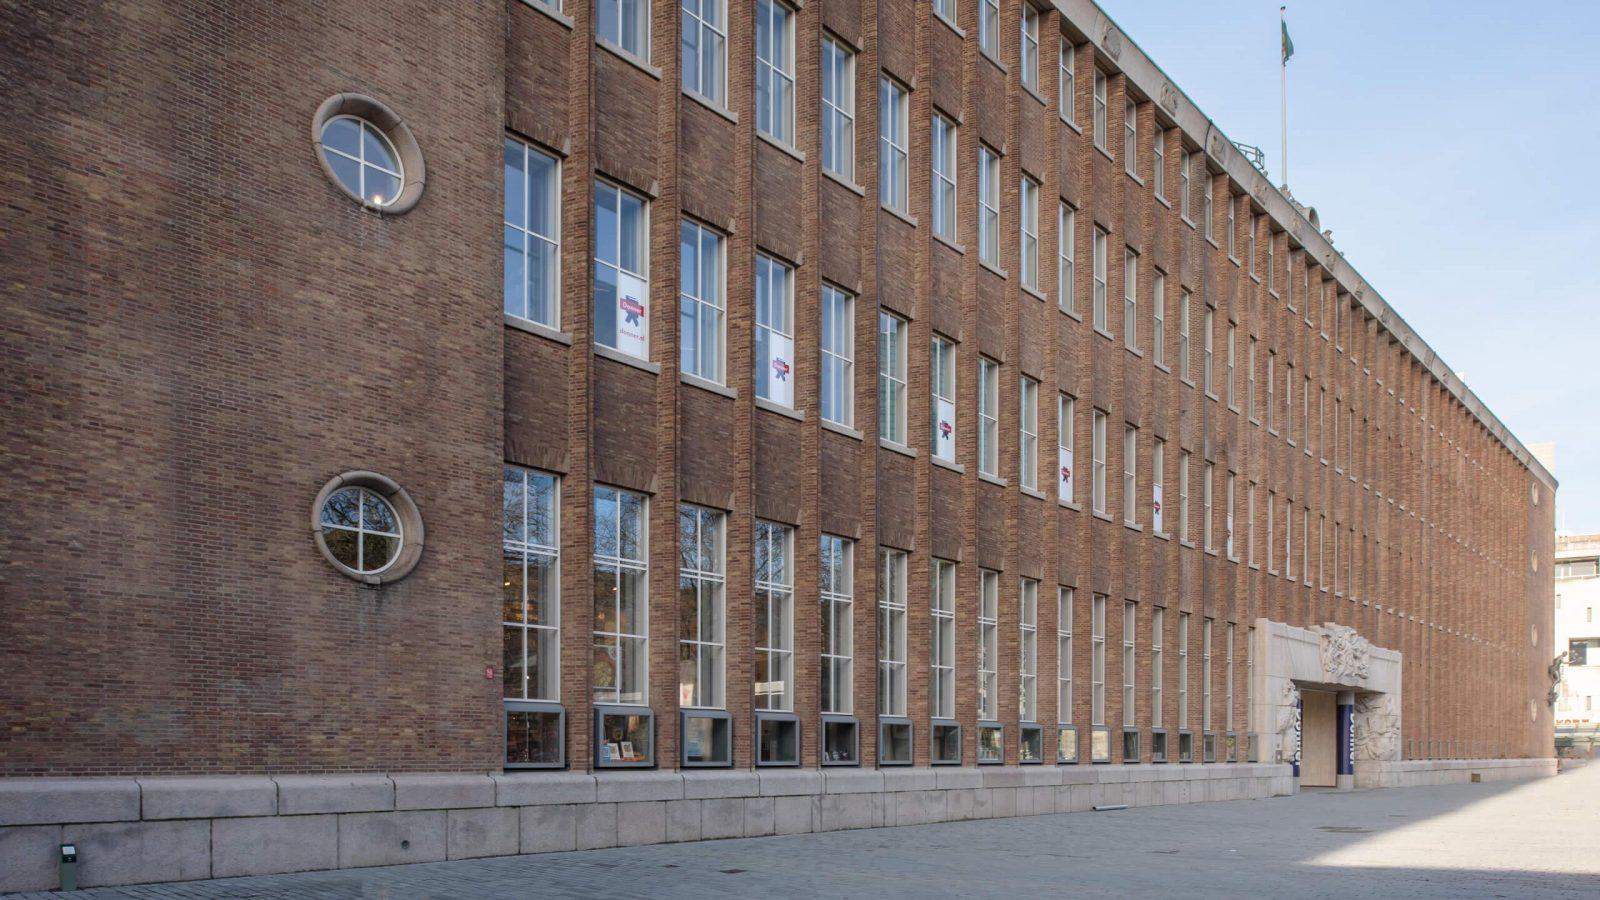 2020 Rotterdamsche Bank ML DSC 7081 2